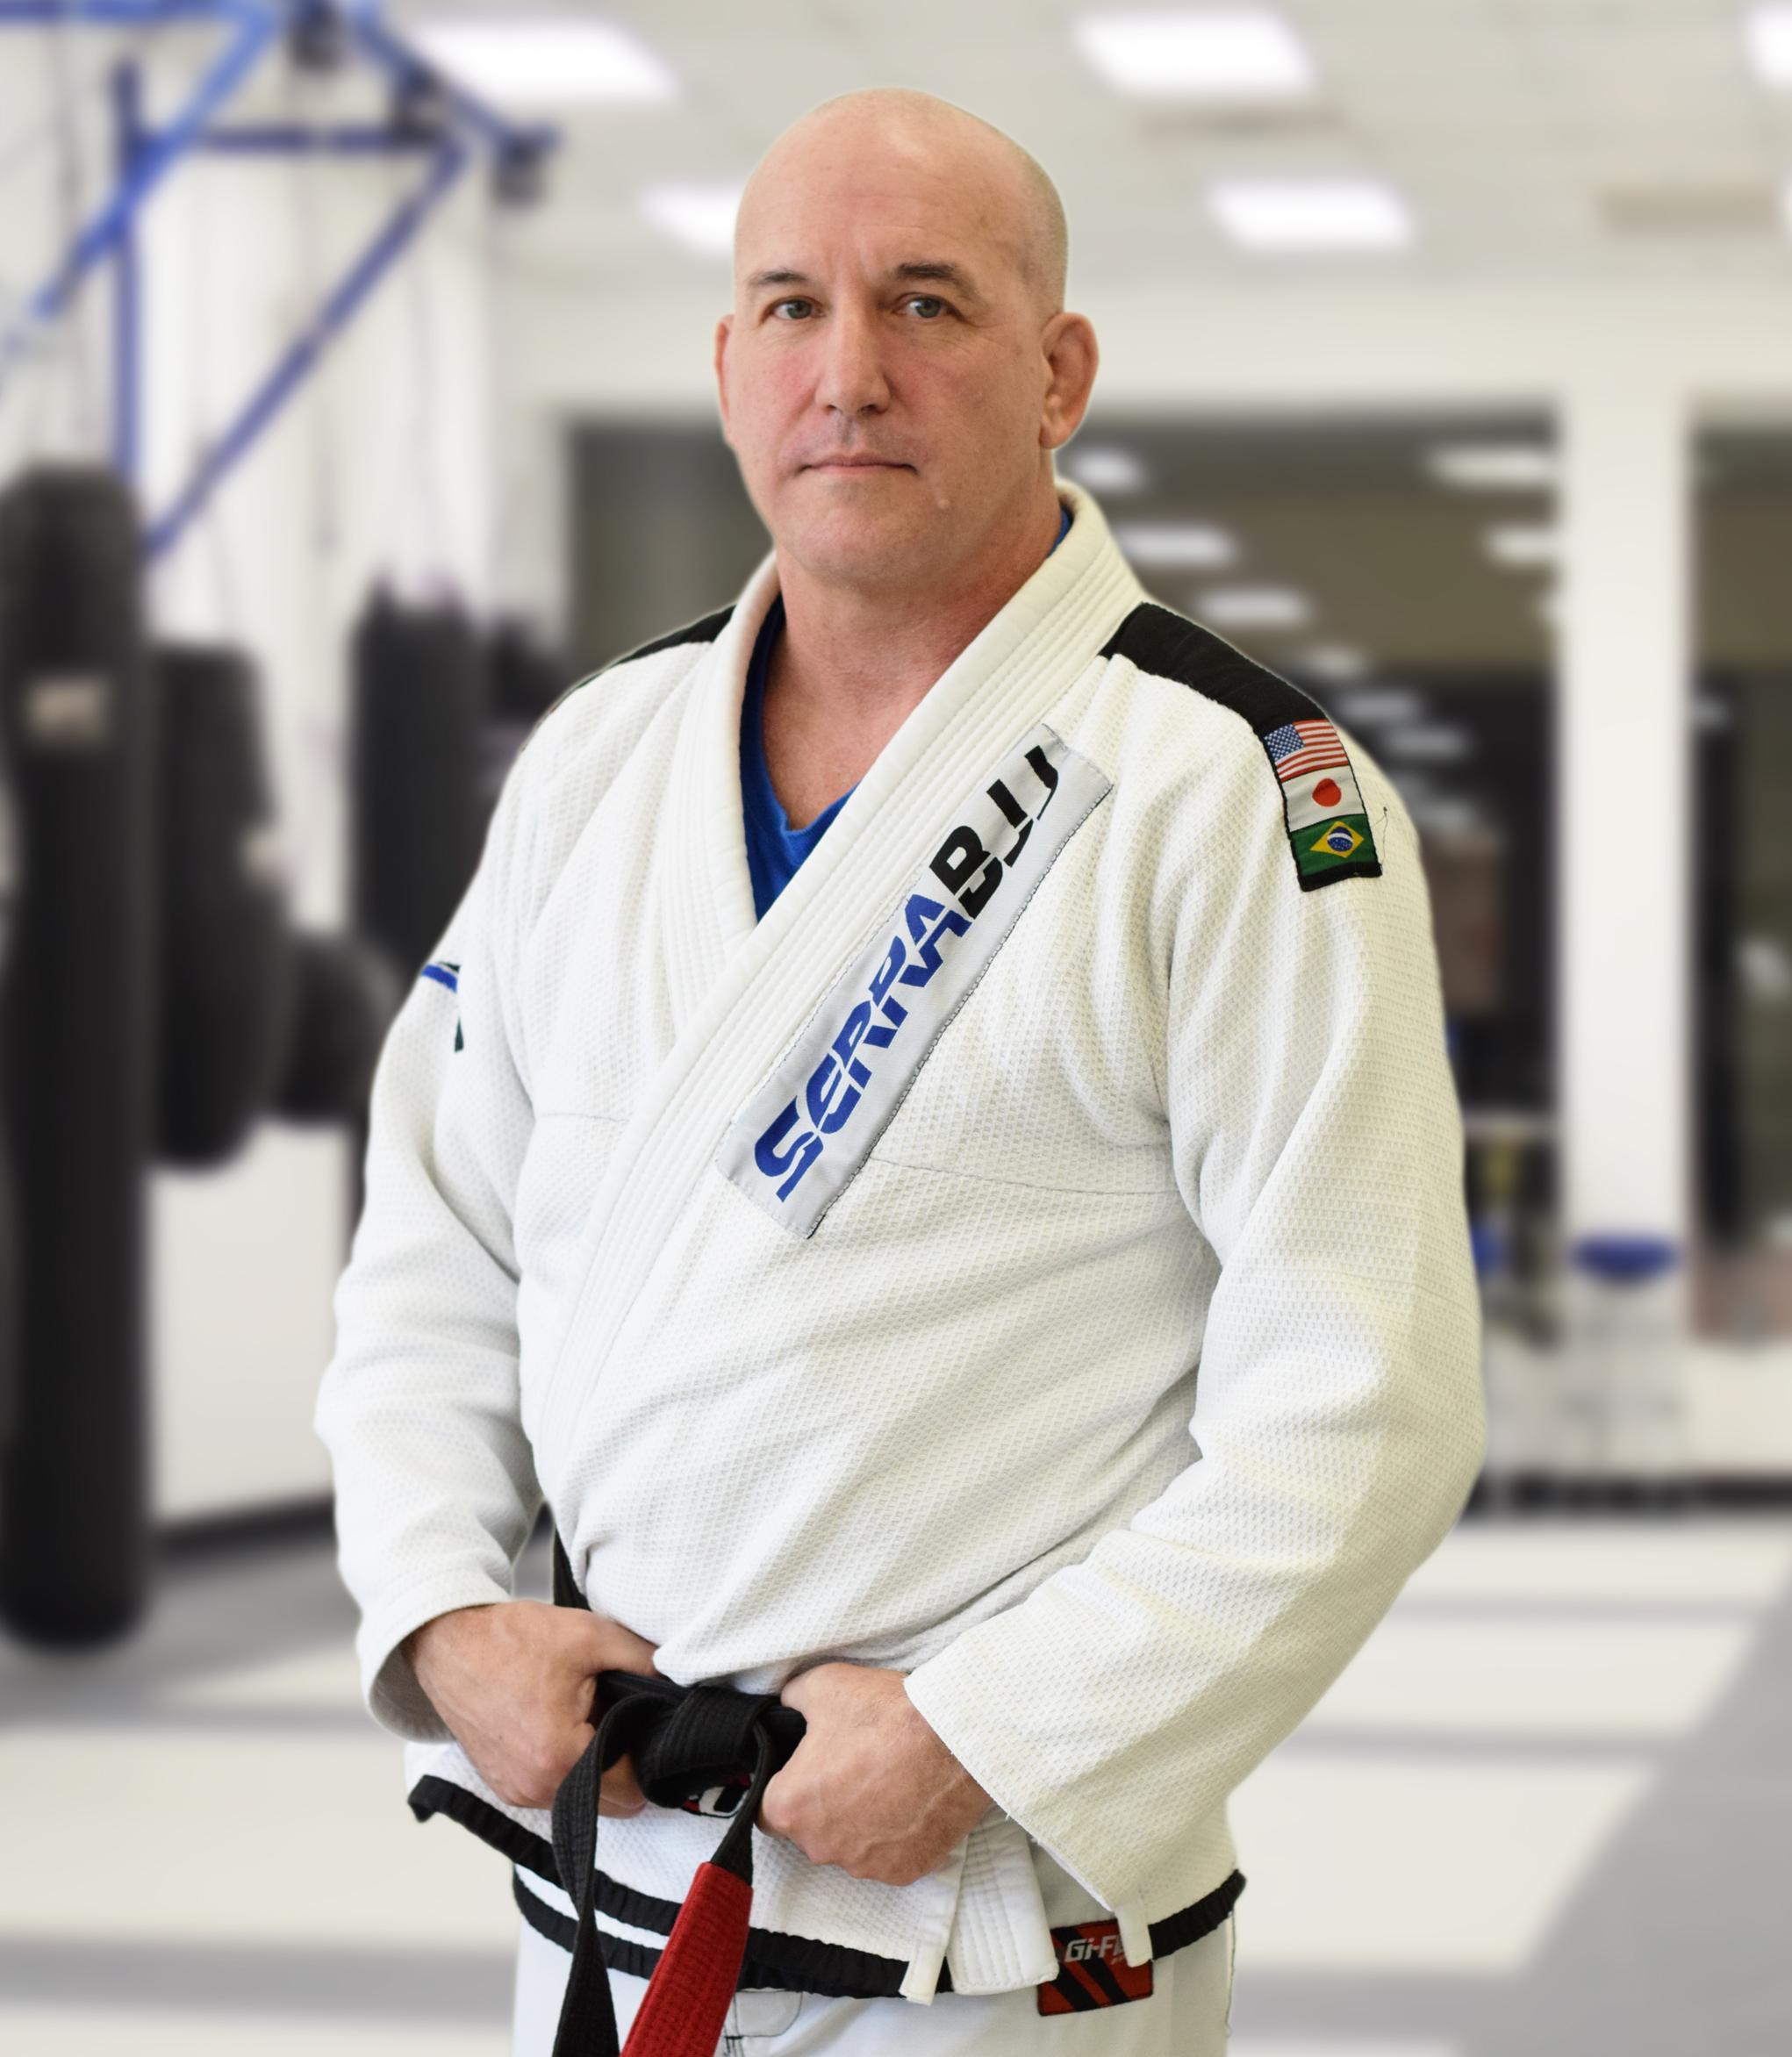 jim_instructor.jpg